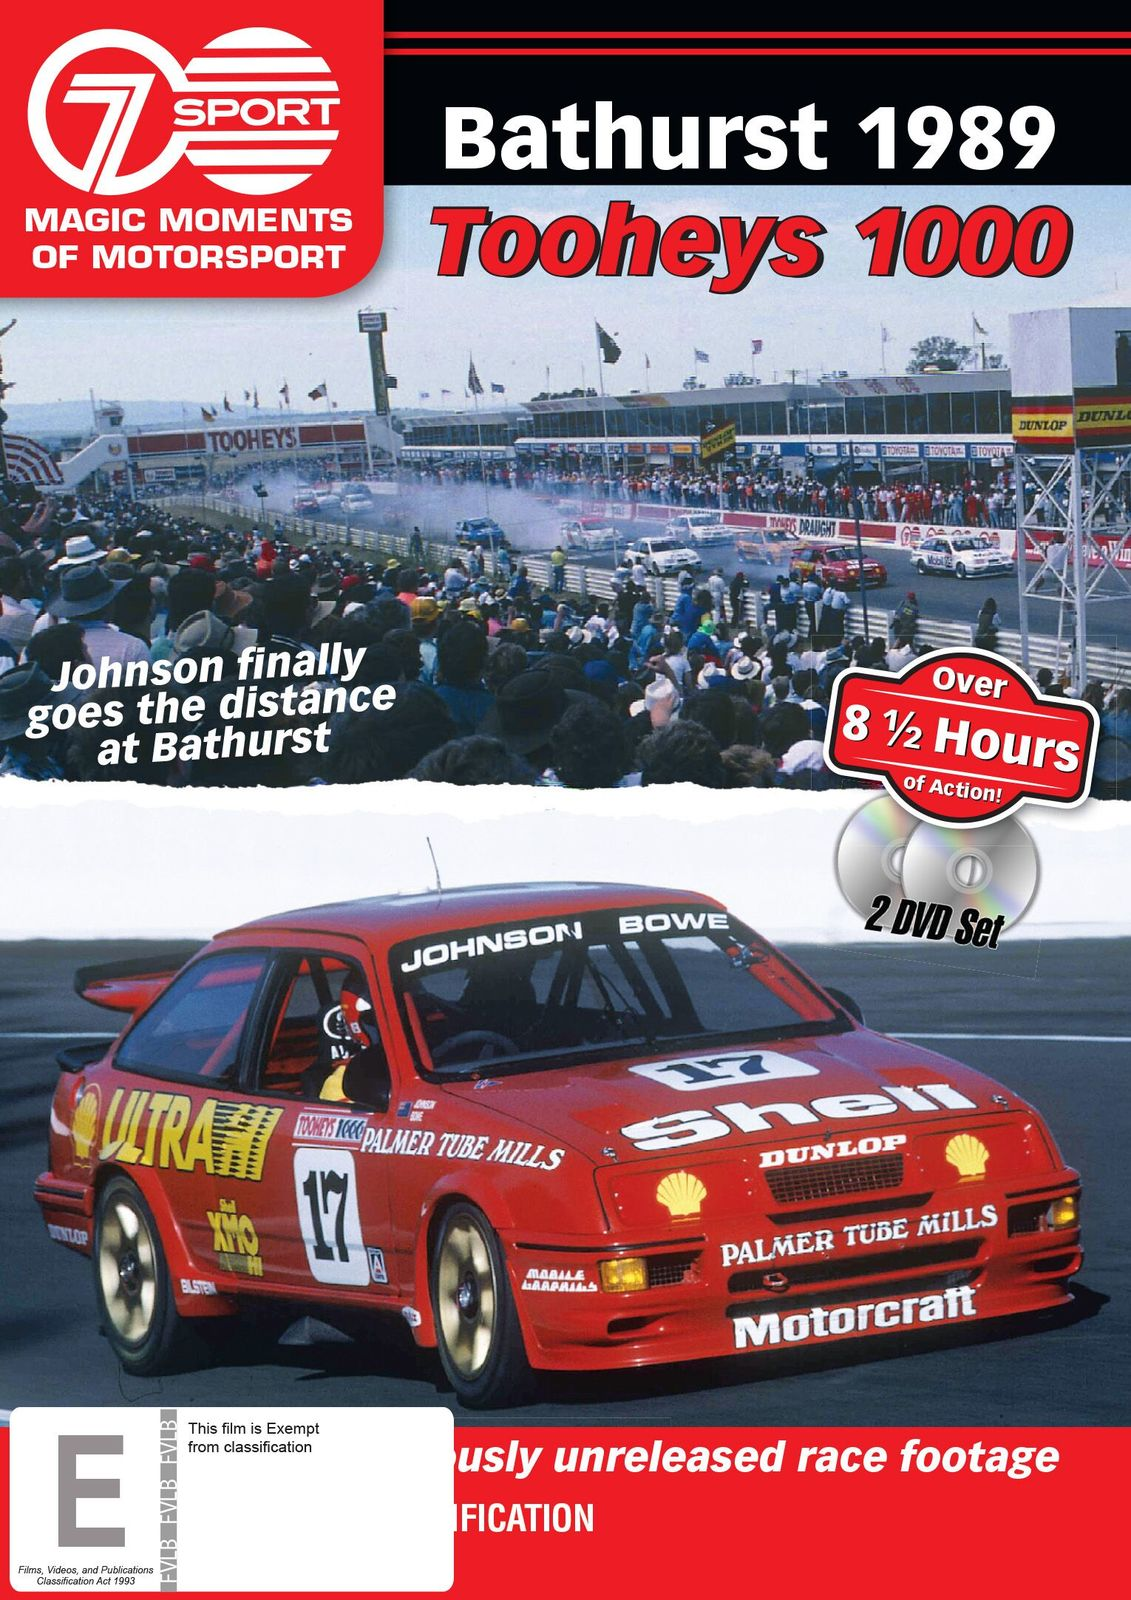 Magic Moments of Motorsport: 1989 Tooheys 1000 image